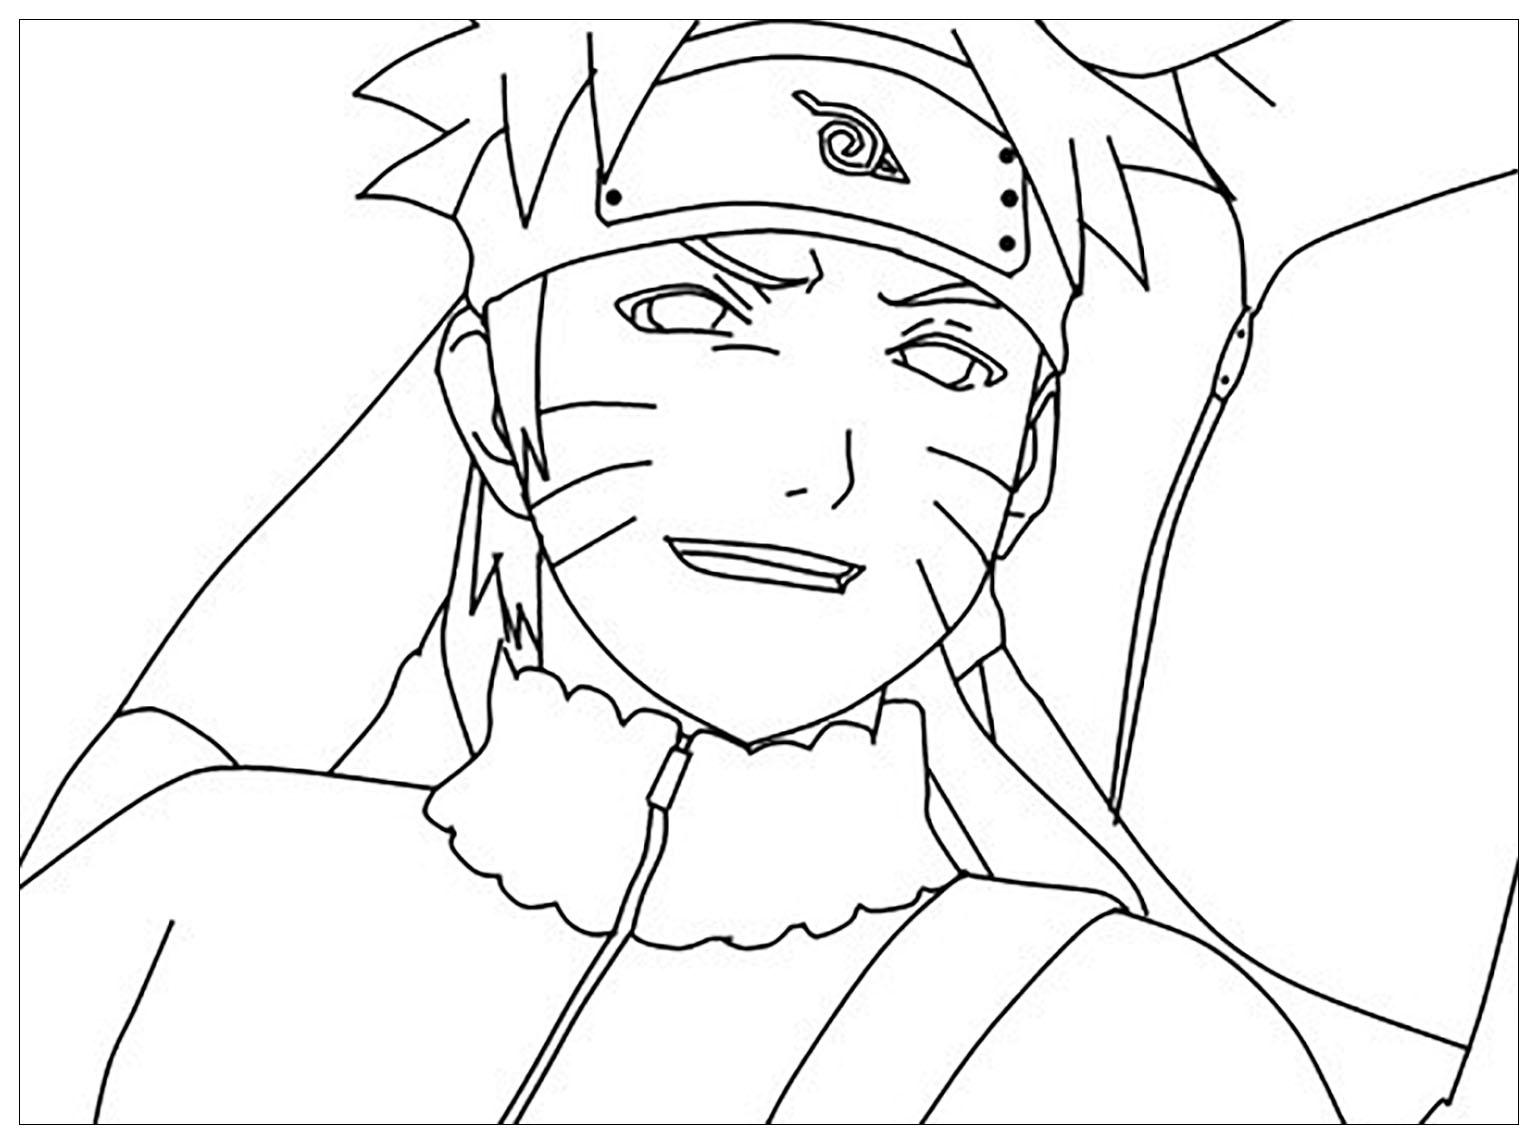 Naruto souriant - Coloriage Naruto - Coloriages pour enfants